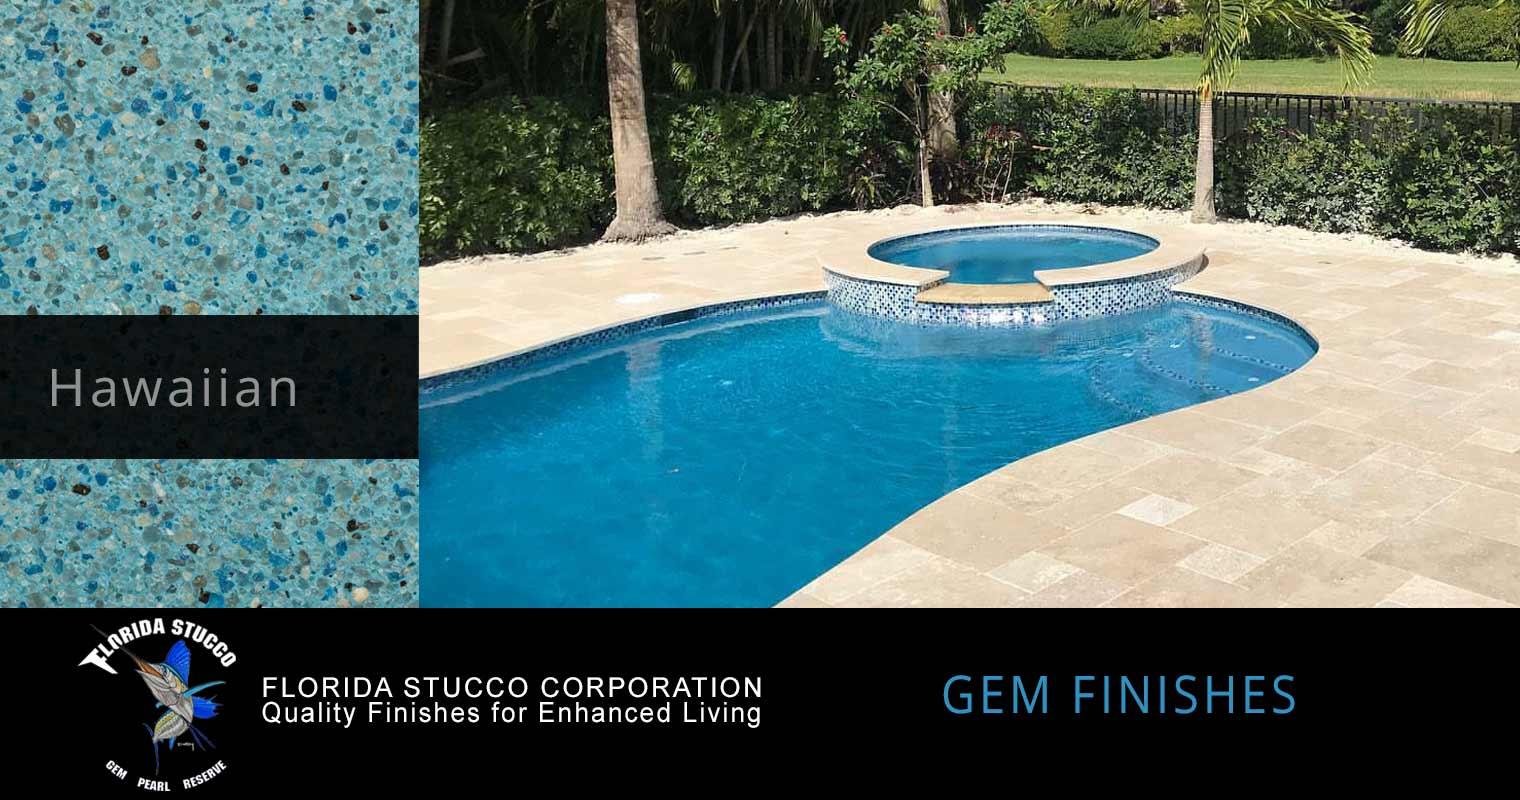 Florida Stucco - Hawaiian Plastering Finish Pool Sample 1